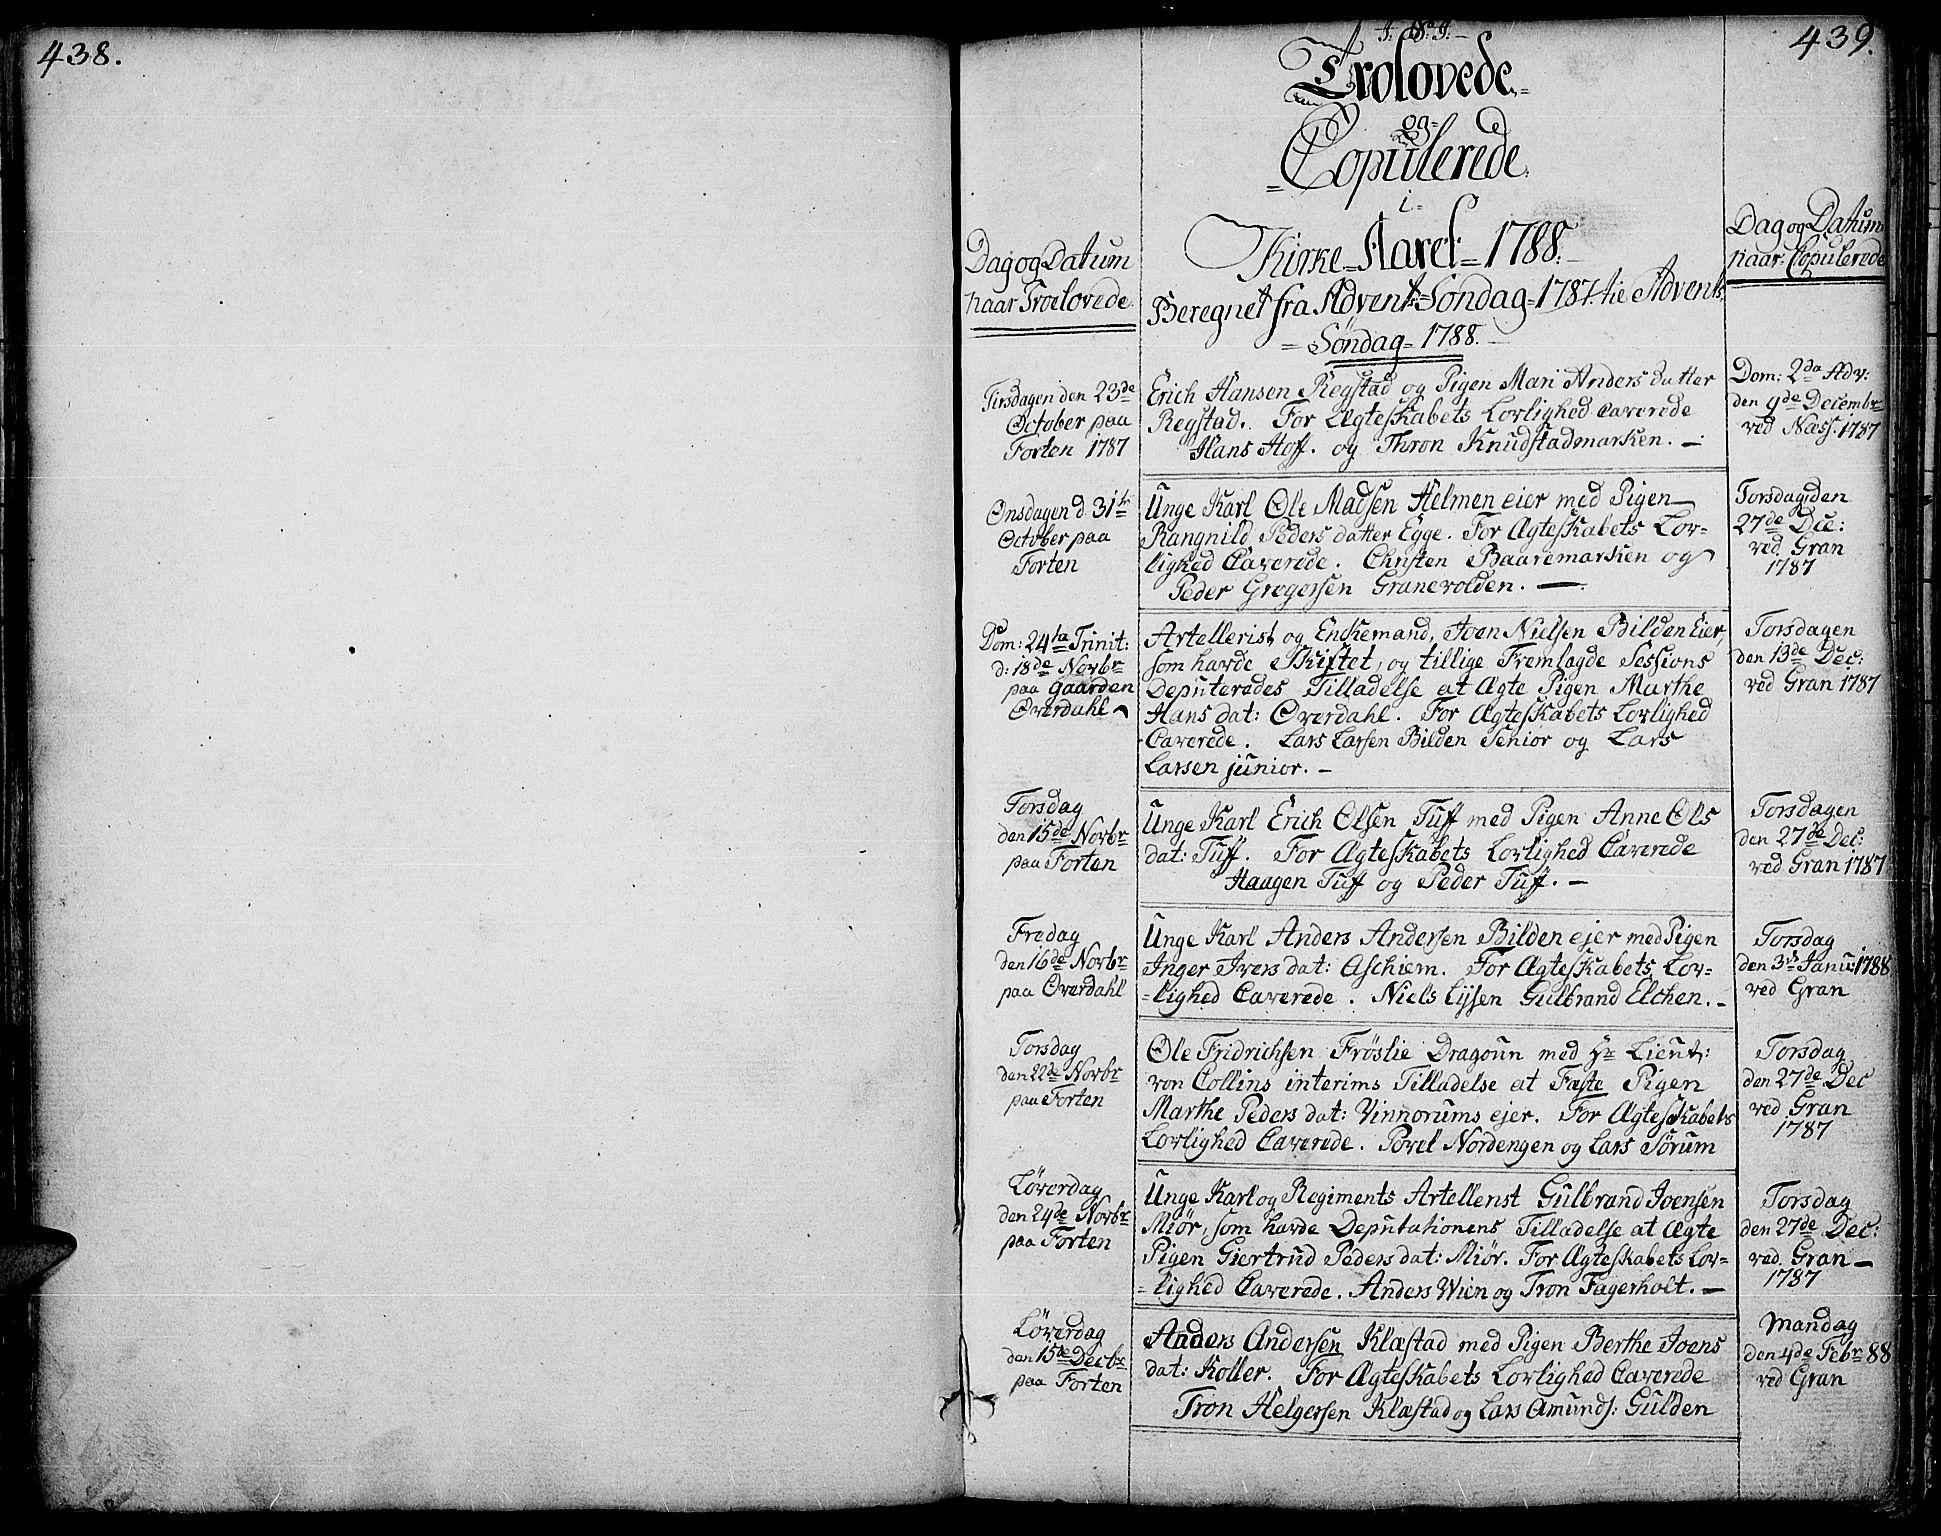 SAH, Gran prestekontor, Ministerialbok nr. 6, 1787-1824, s. 438-439